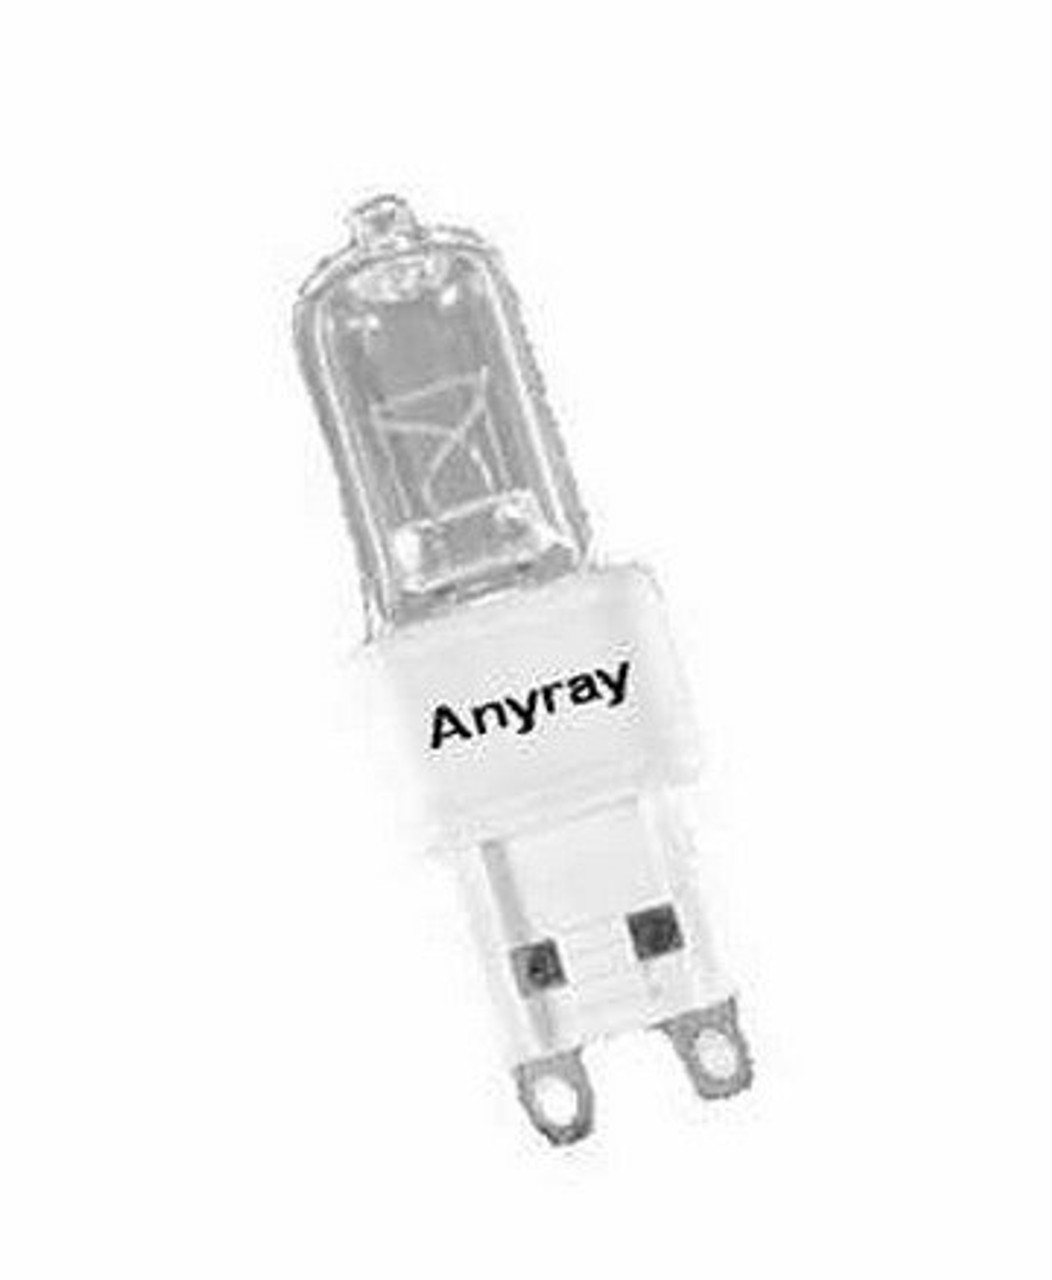 3-Bulbs HR16 120V 25W E27//E26 MR-16 25 Watt JDR C Halogen Bulb Lamp HR 16 with Lens Anyray A1875Y 25 Watts